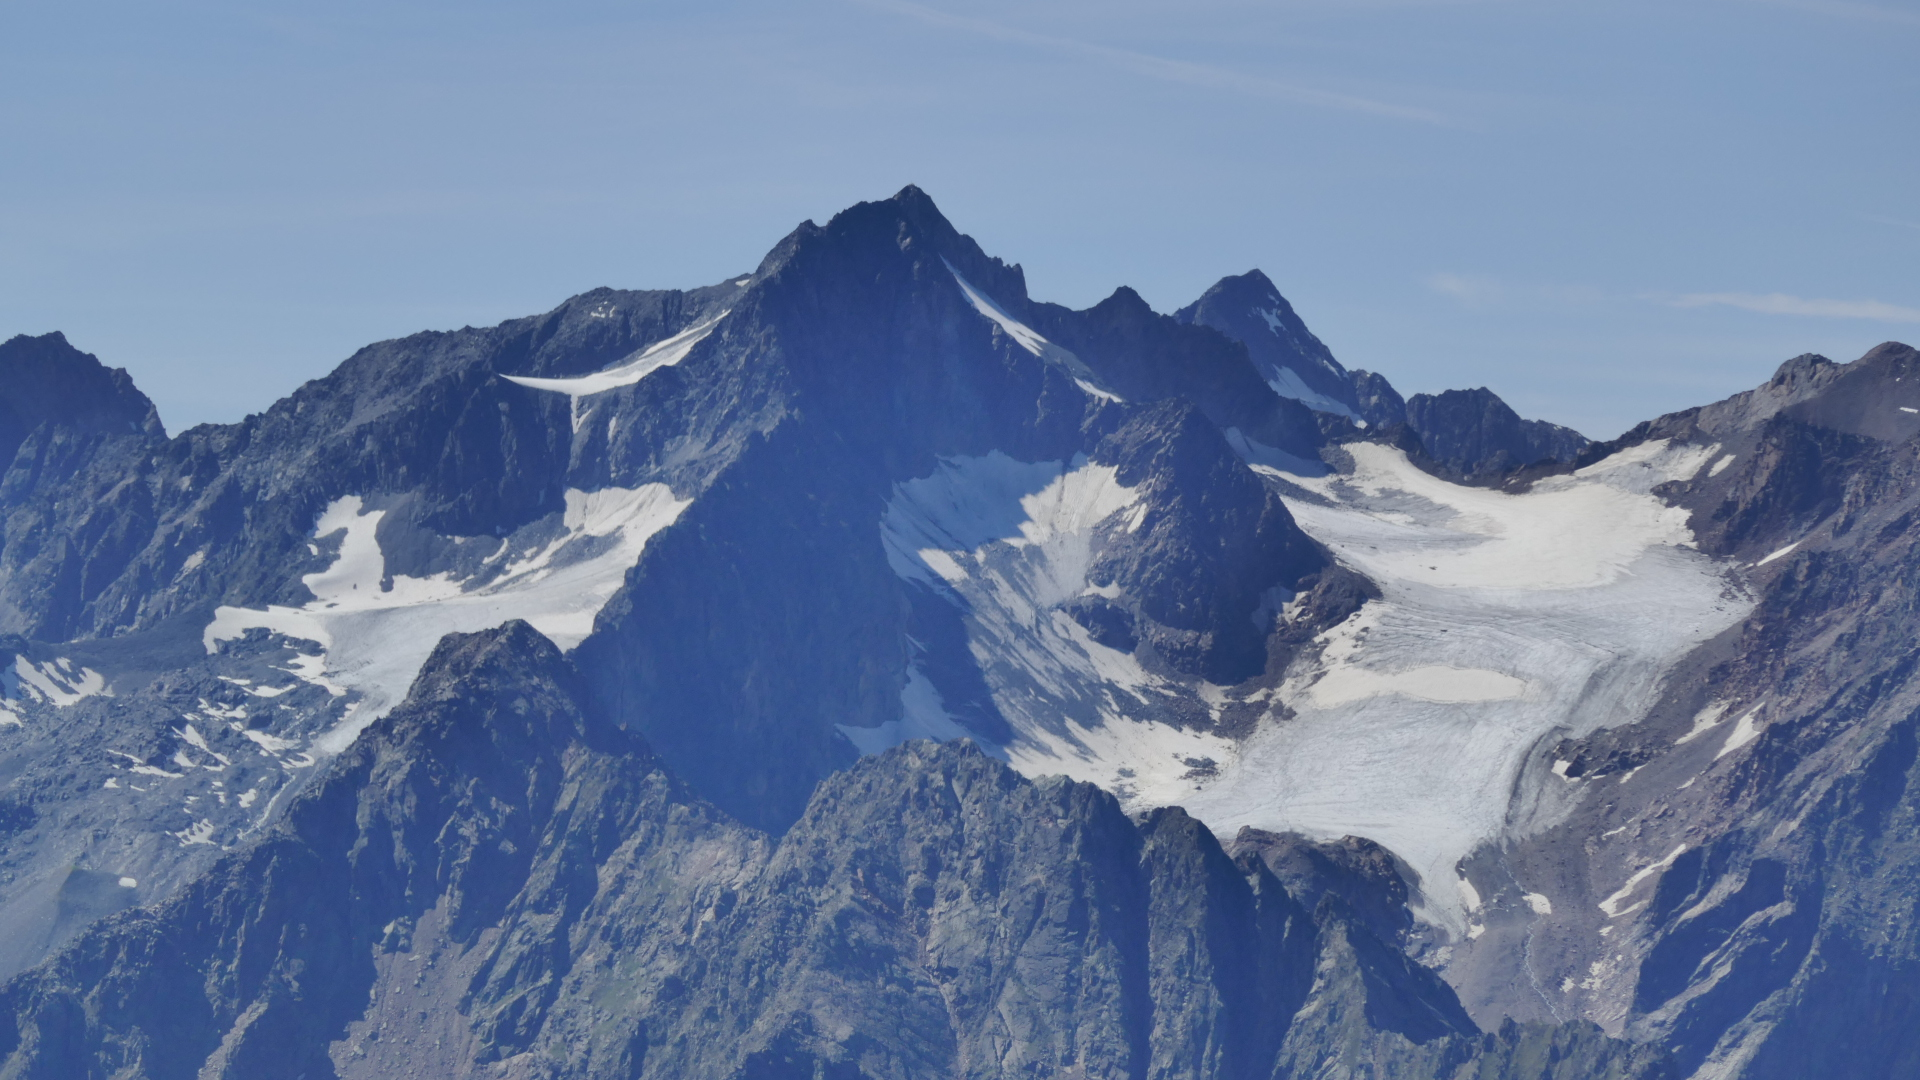 Ruderhofspitze, rechts dahinter Schrankogel